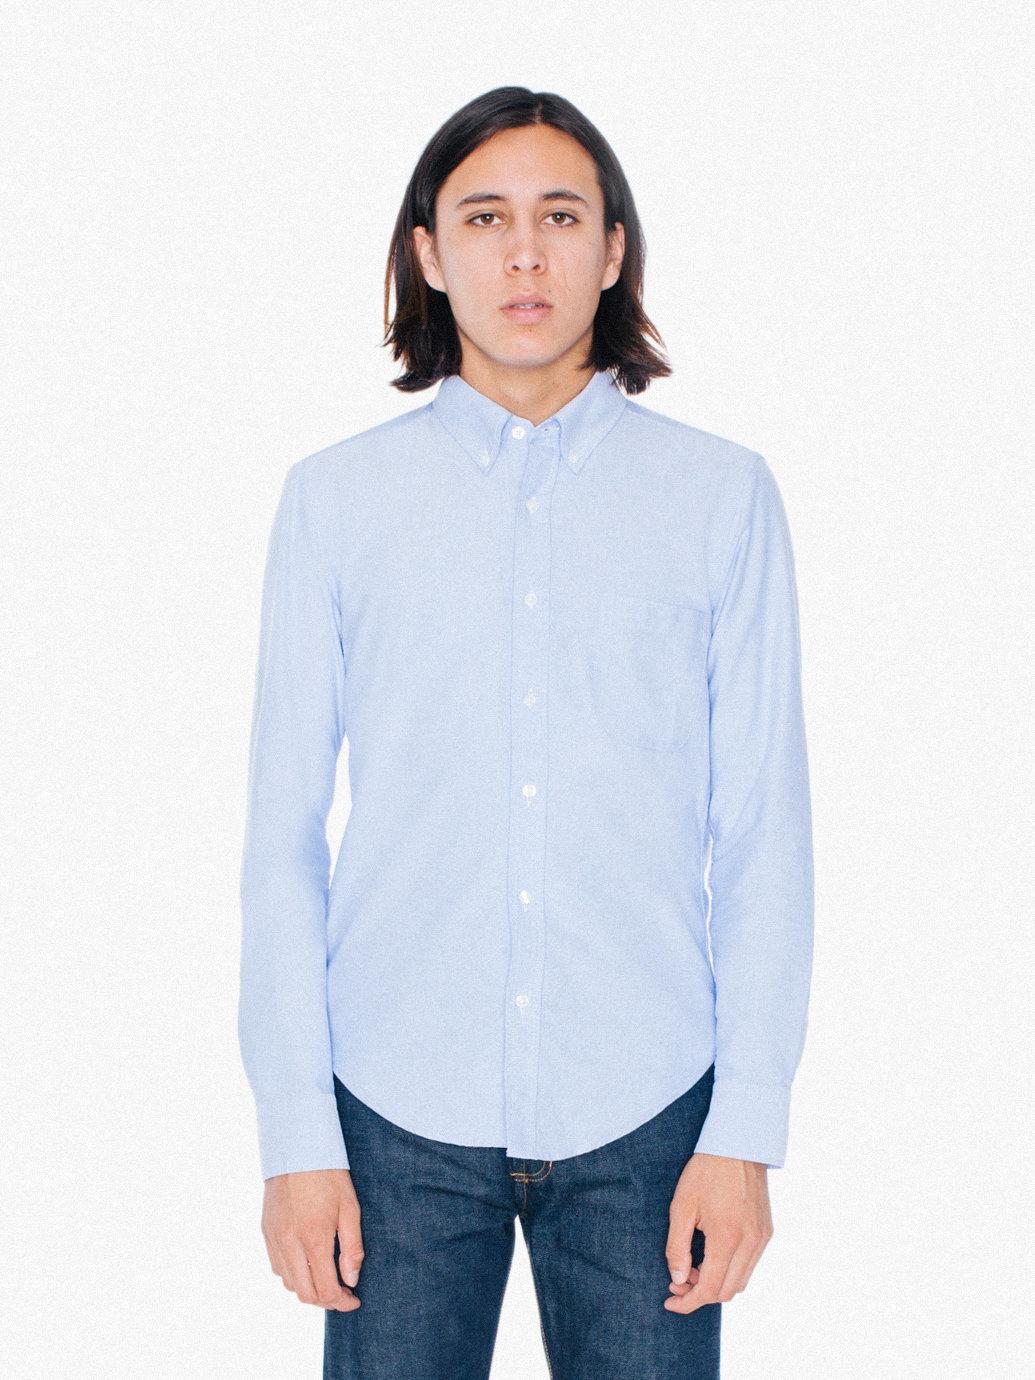 American Apparel Stone Wash Slim Fit Oxford Shirt In Blue